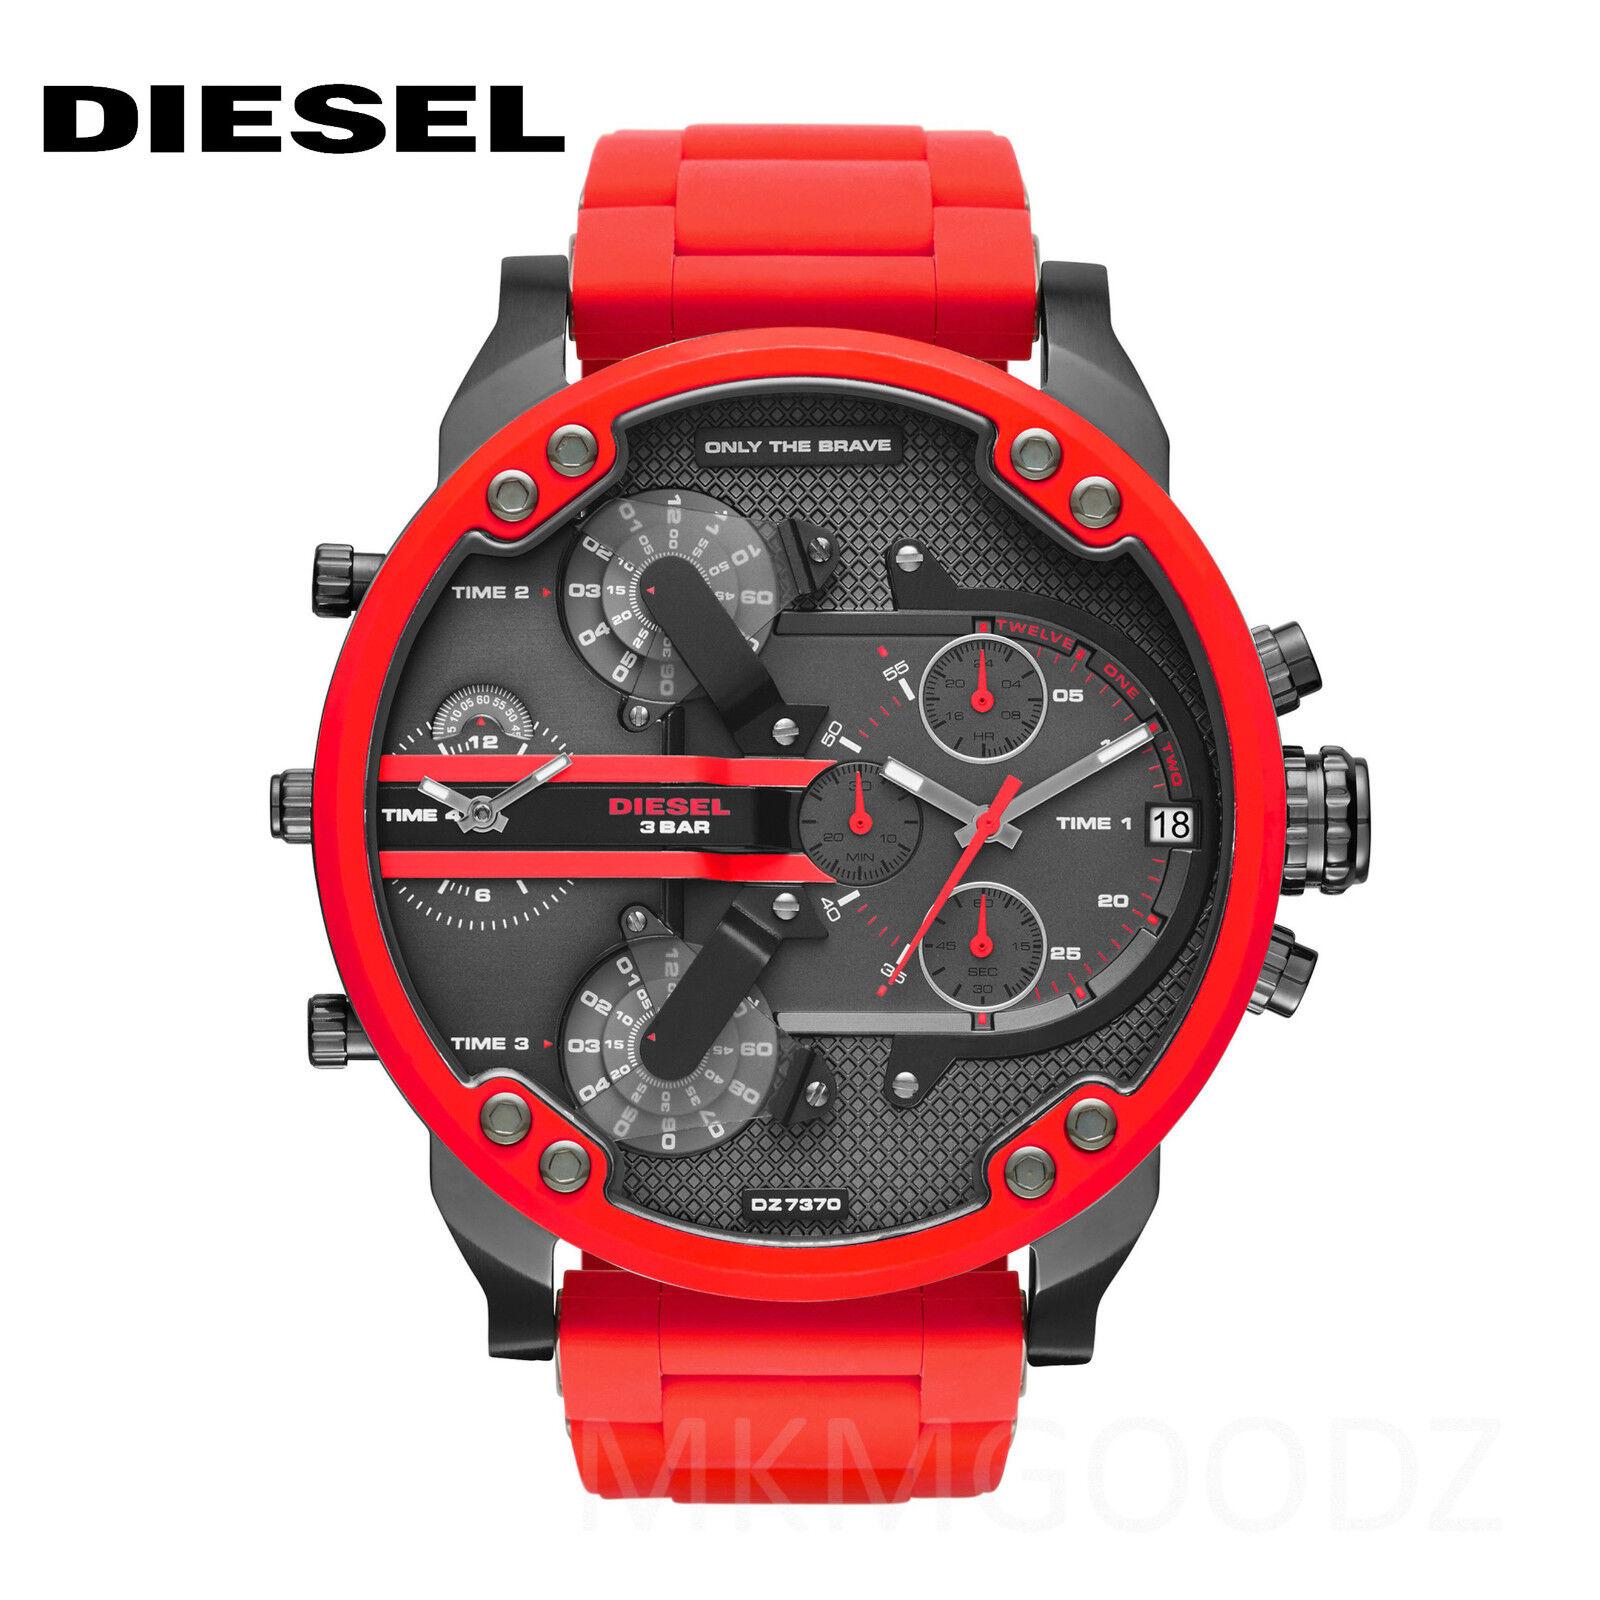 Купить Diesel DZ7370 - NEW Diesel Original DZ7370 Mr Daddy 2.0 Red Chronograph Watch 57mm